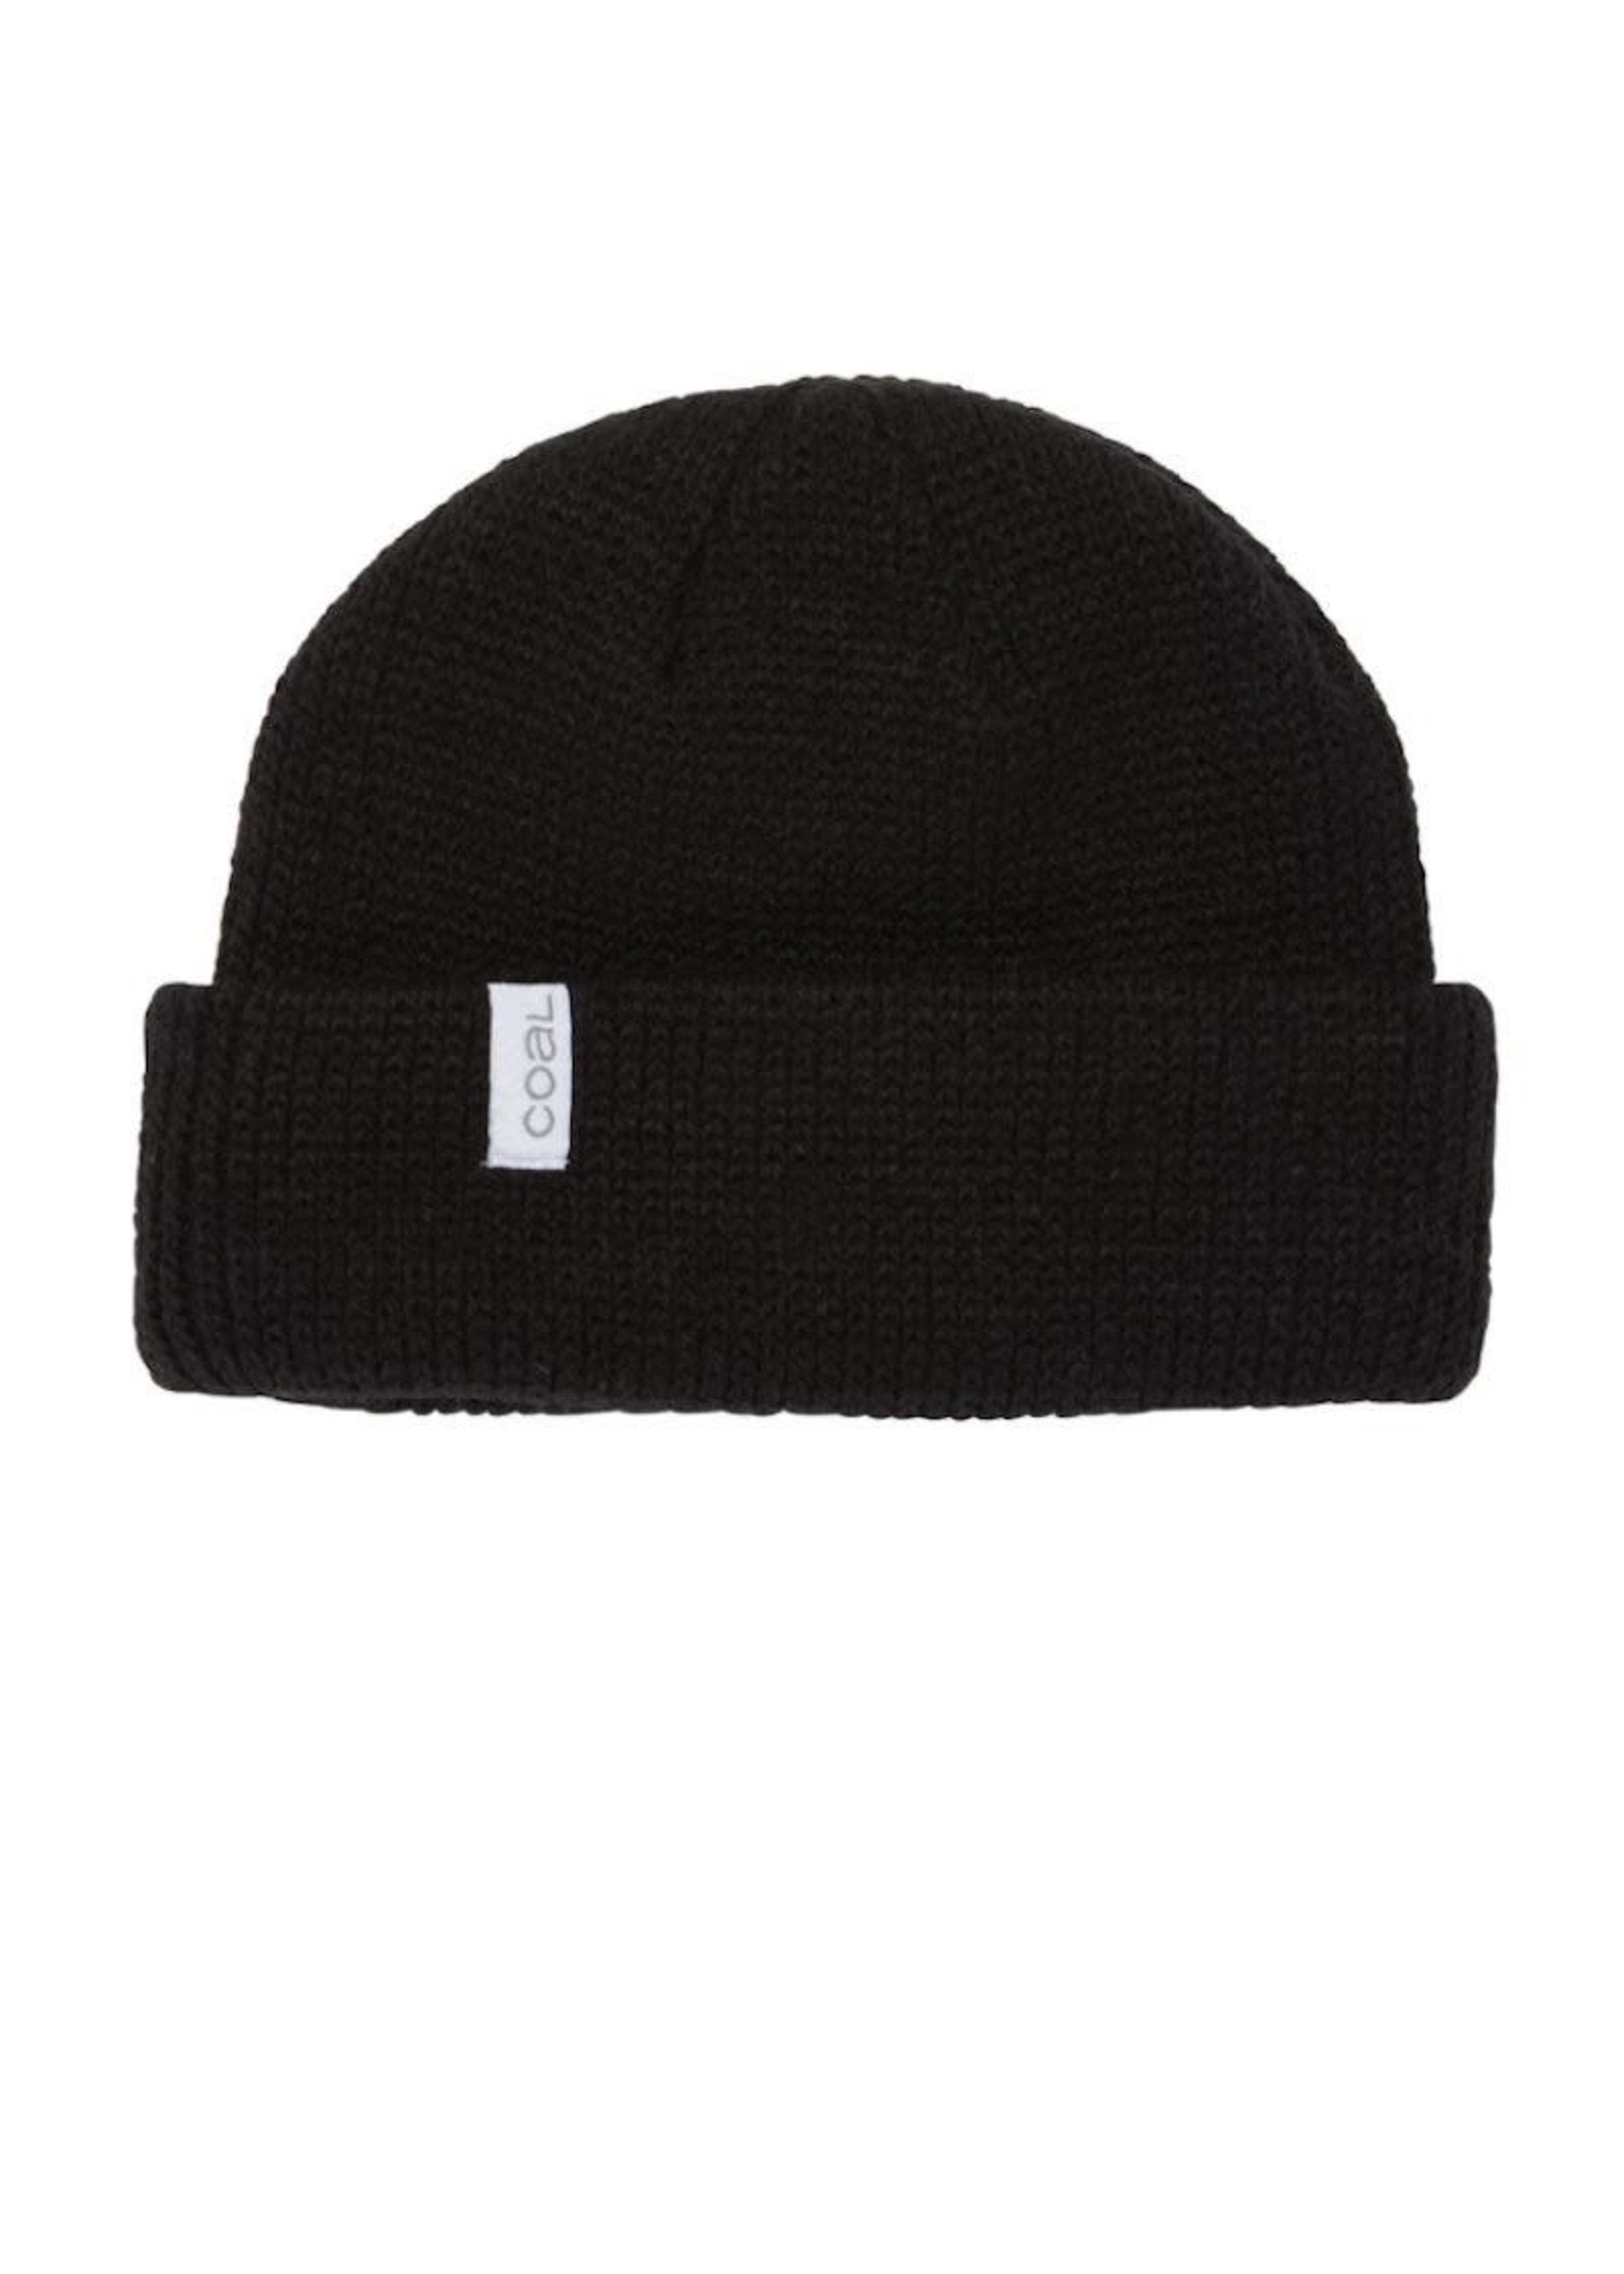 Coal Coal Headwear, The Frena Kids Thick Knit Beanie in Black